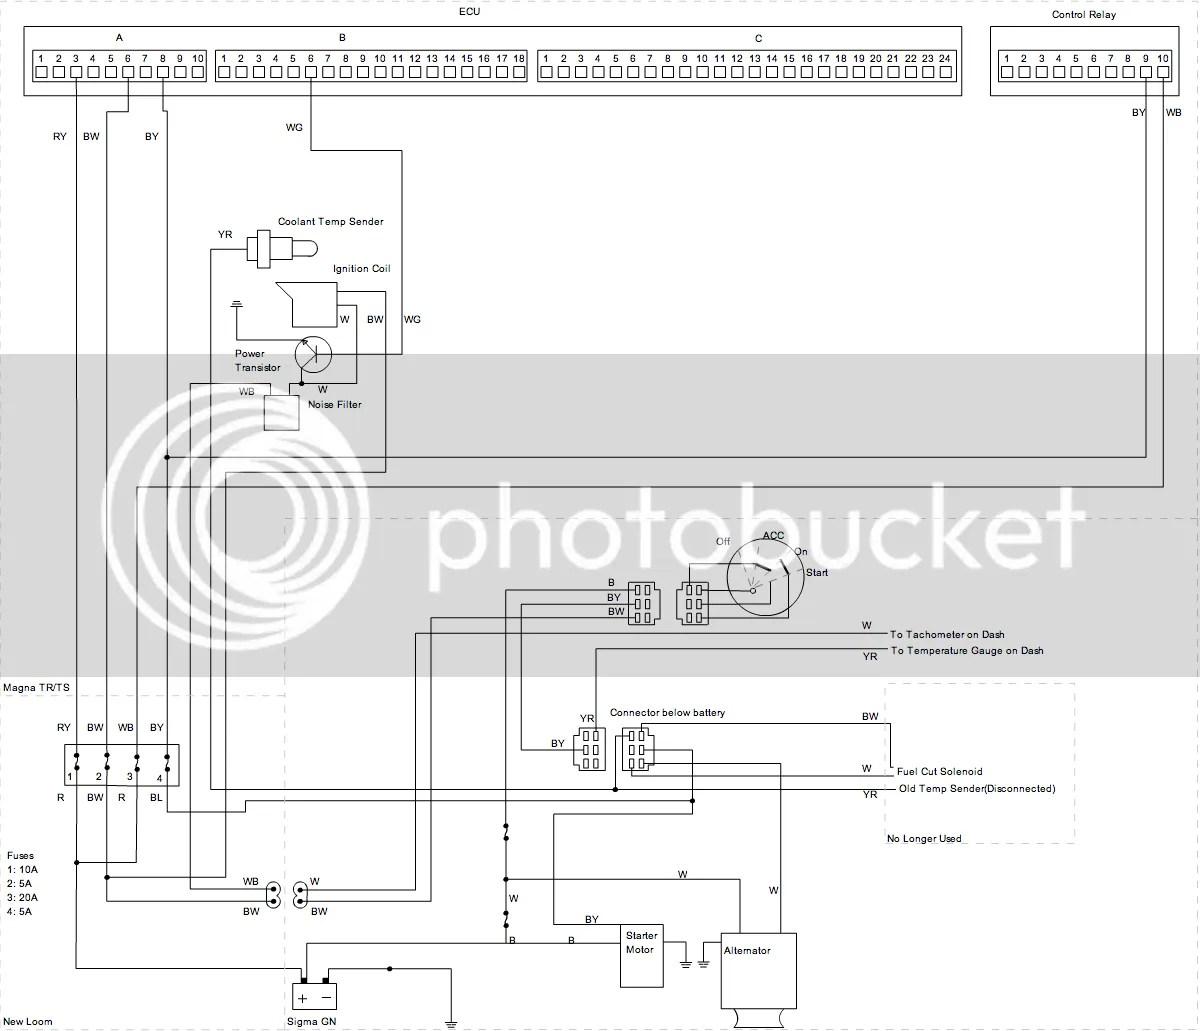 Mando Alternator Wiring Diagram For Gm Free Download Wiring Diagram